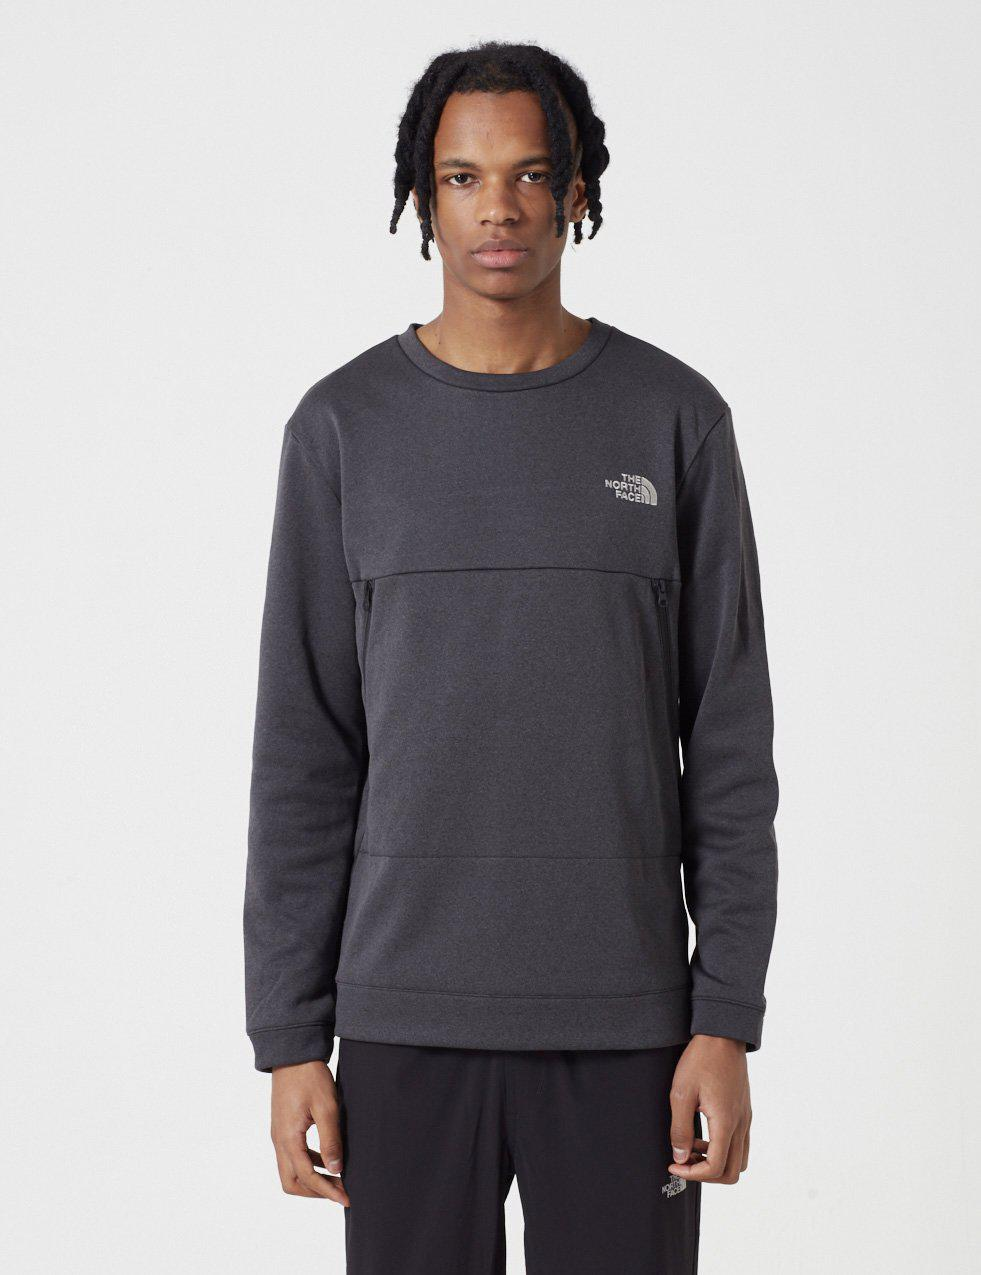 f73595ffb The North Face Black Label Tech Crew Sweatshirt for Men - Lyst